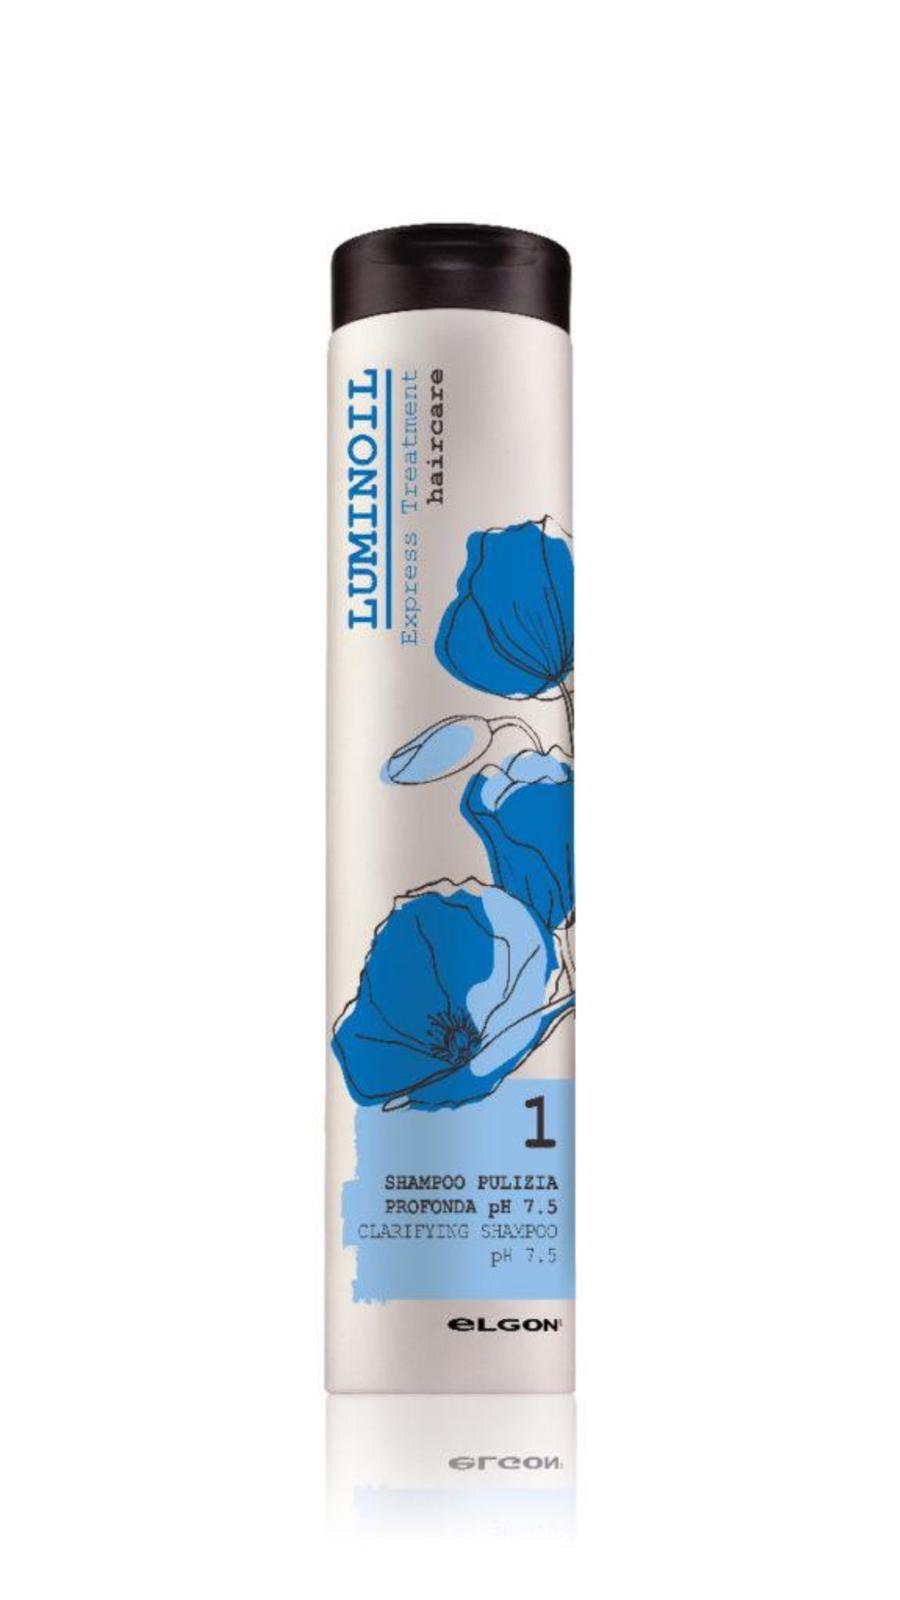 Shampoo Pulizia Profonda - LUMINOIL